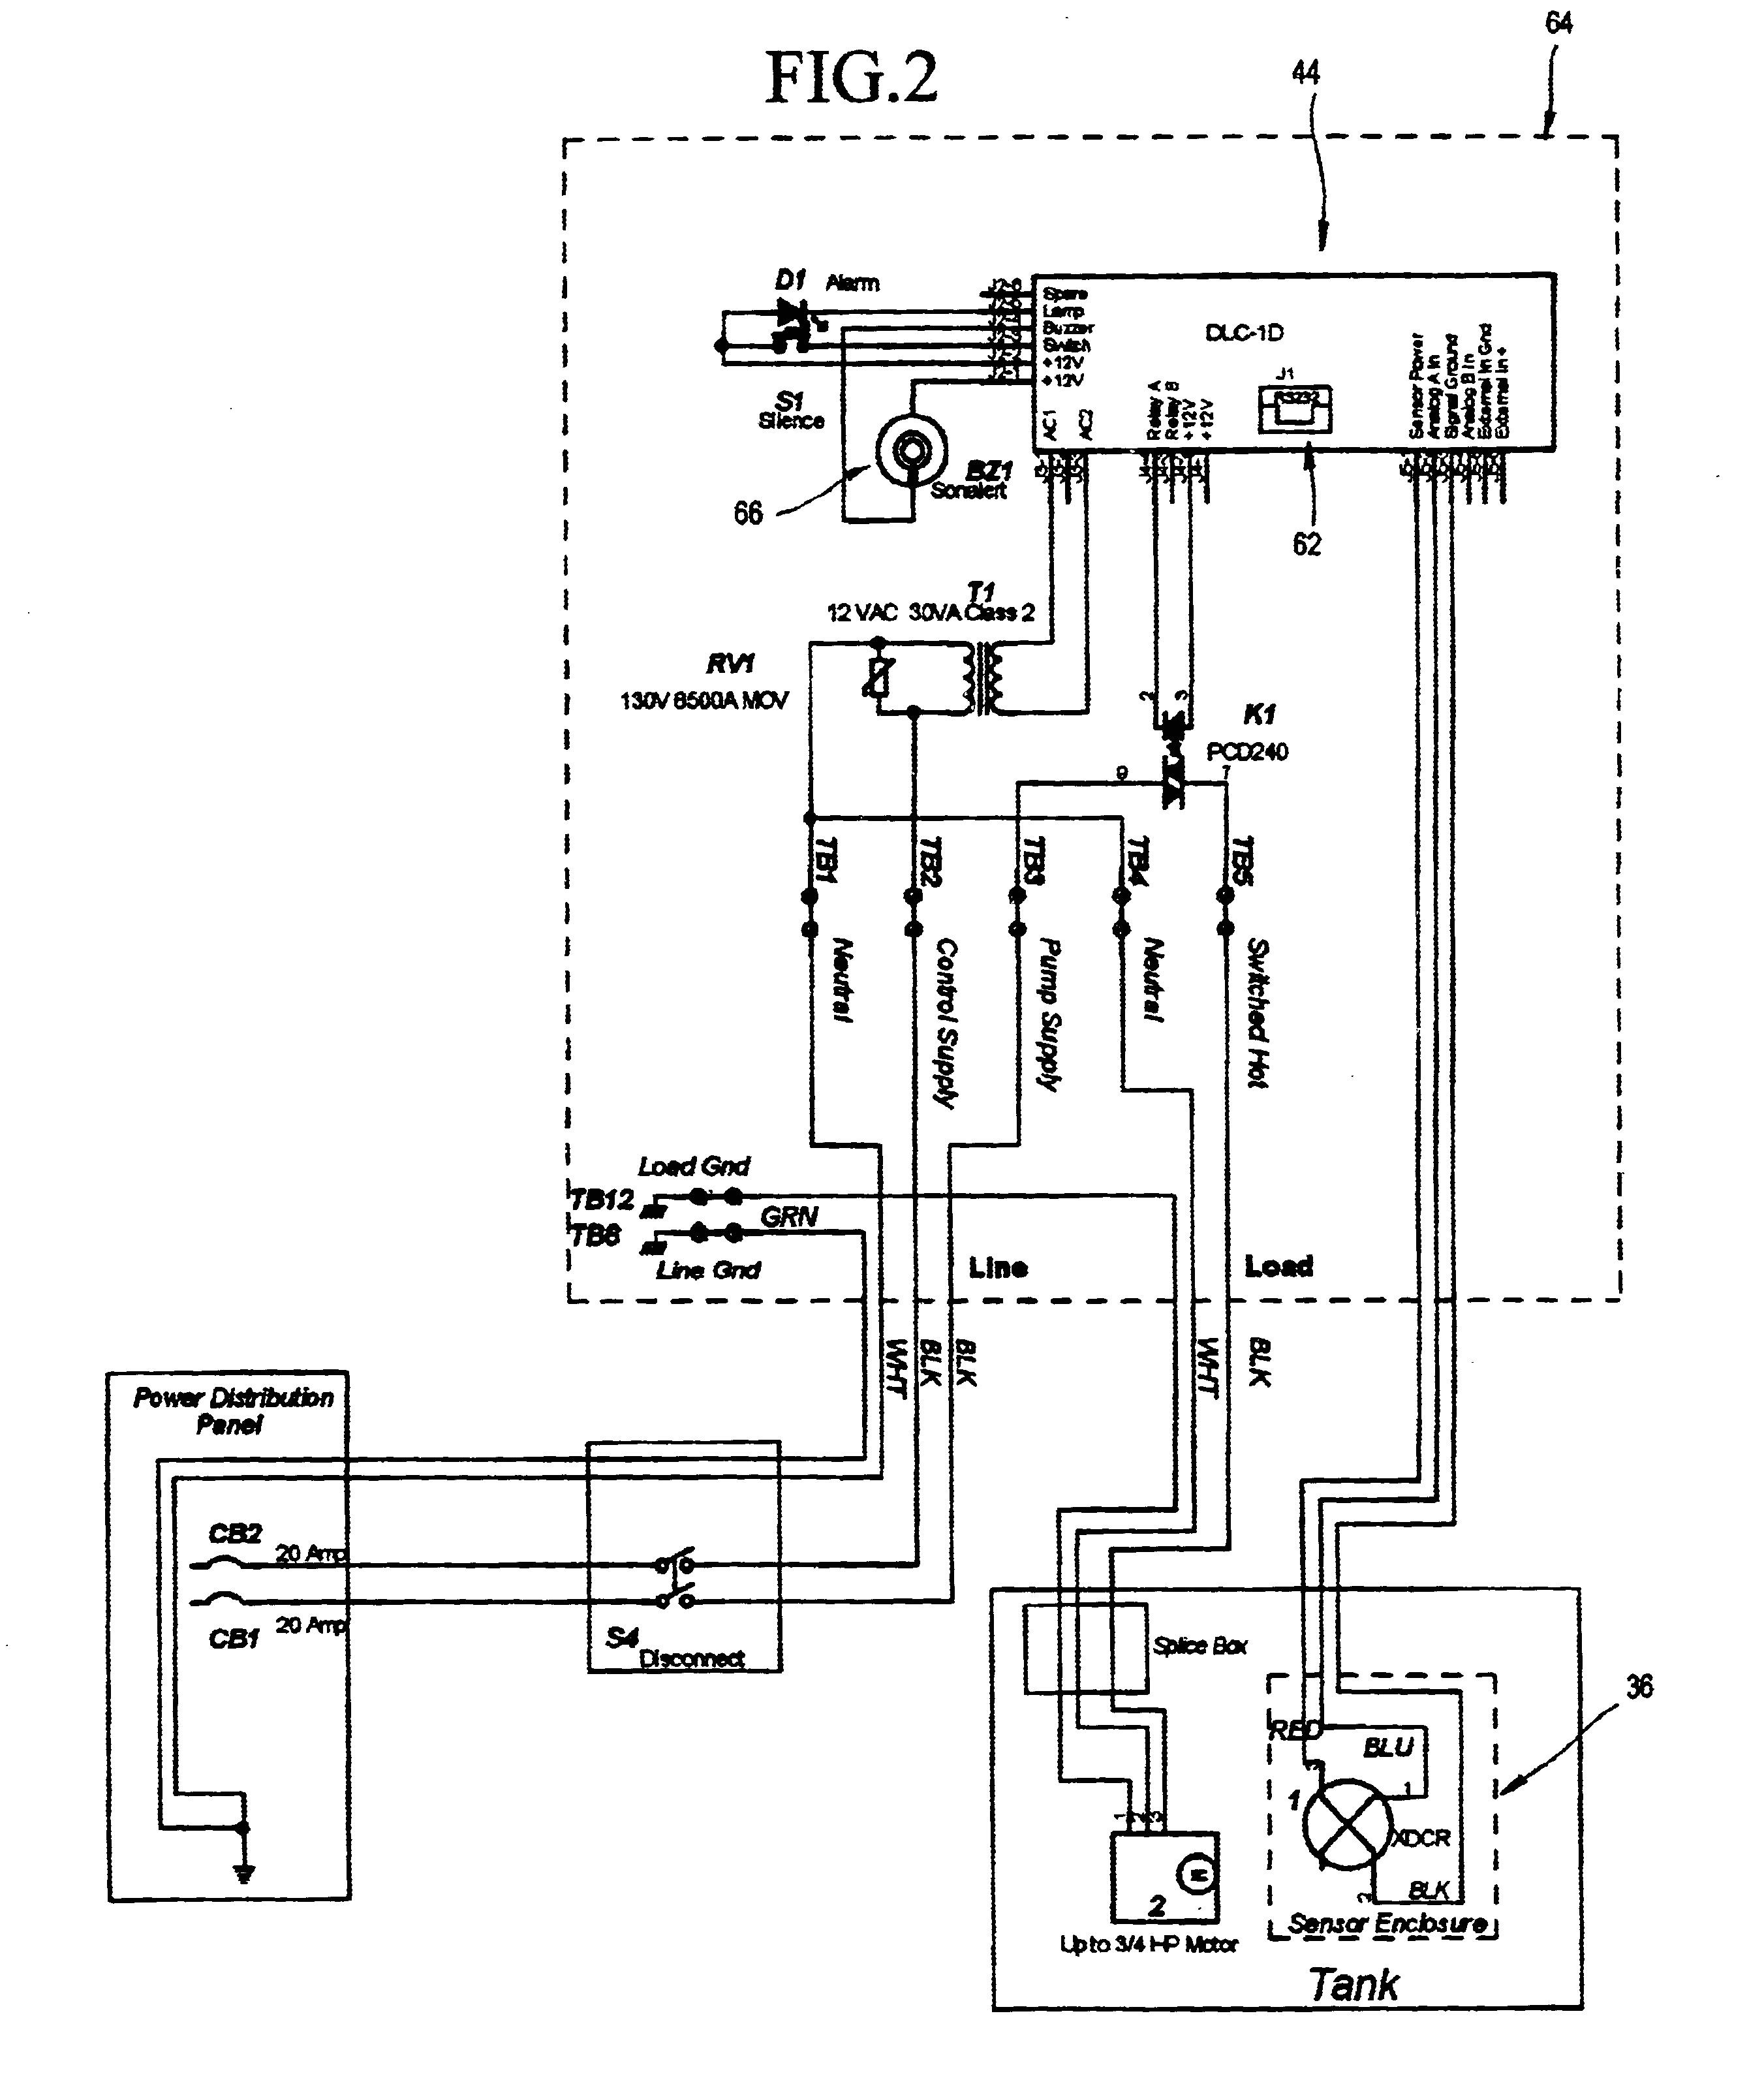 sump pump control panel wiring diagram unique flygt pump wiring diagram wiring diagrams schematics